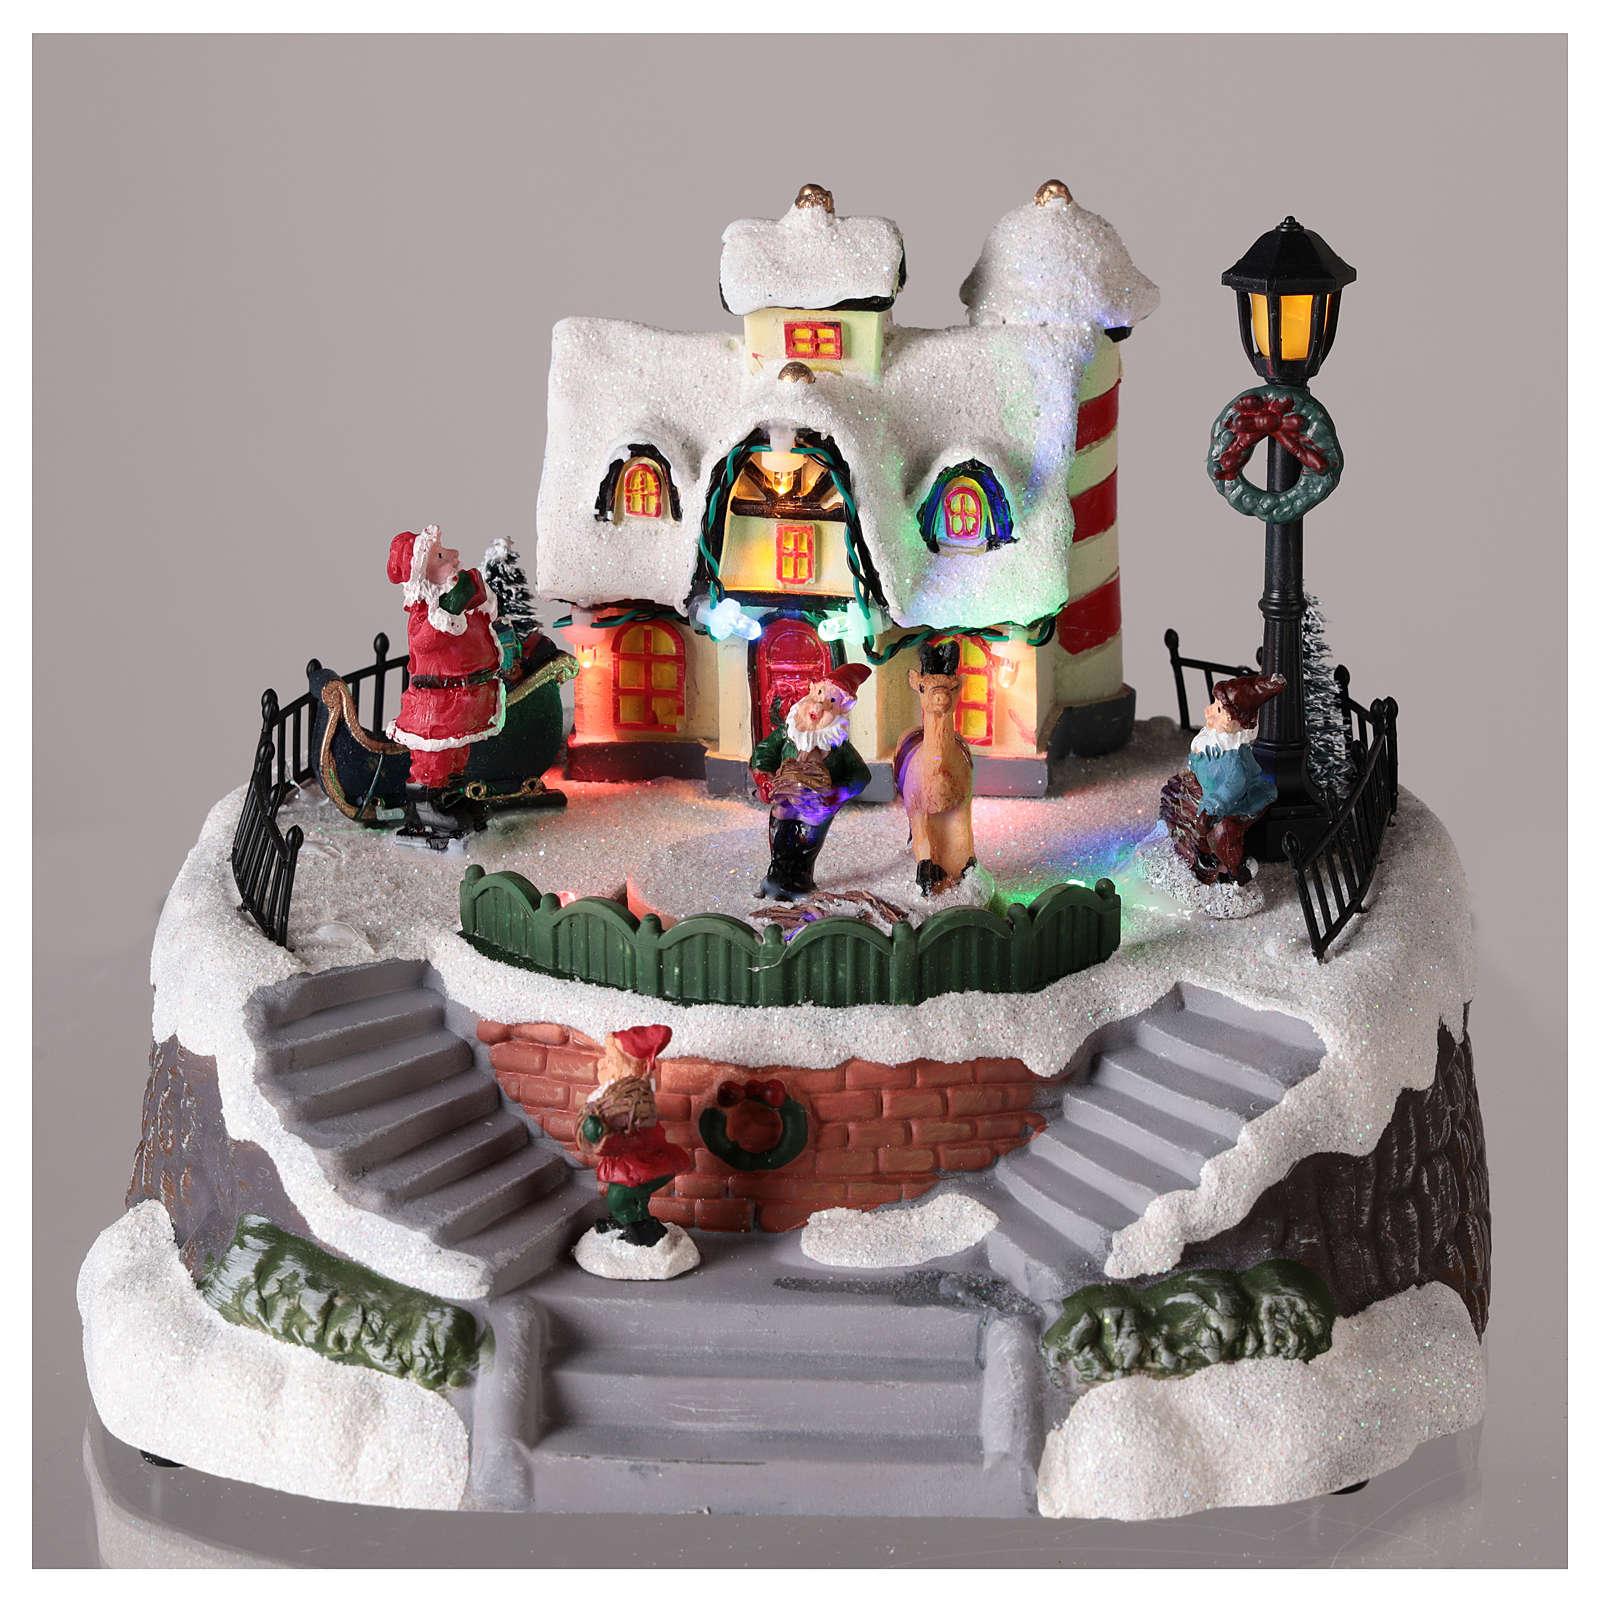 Santa Claus house with elvis for village 15x20 cm 3